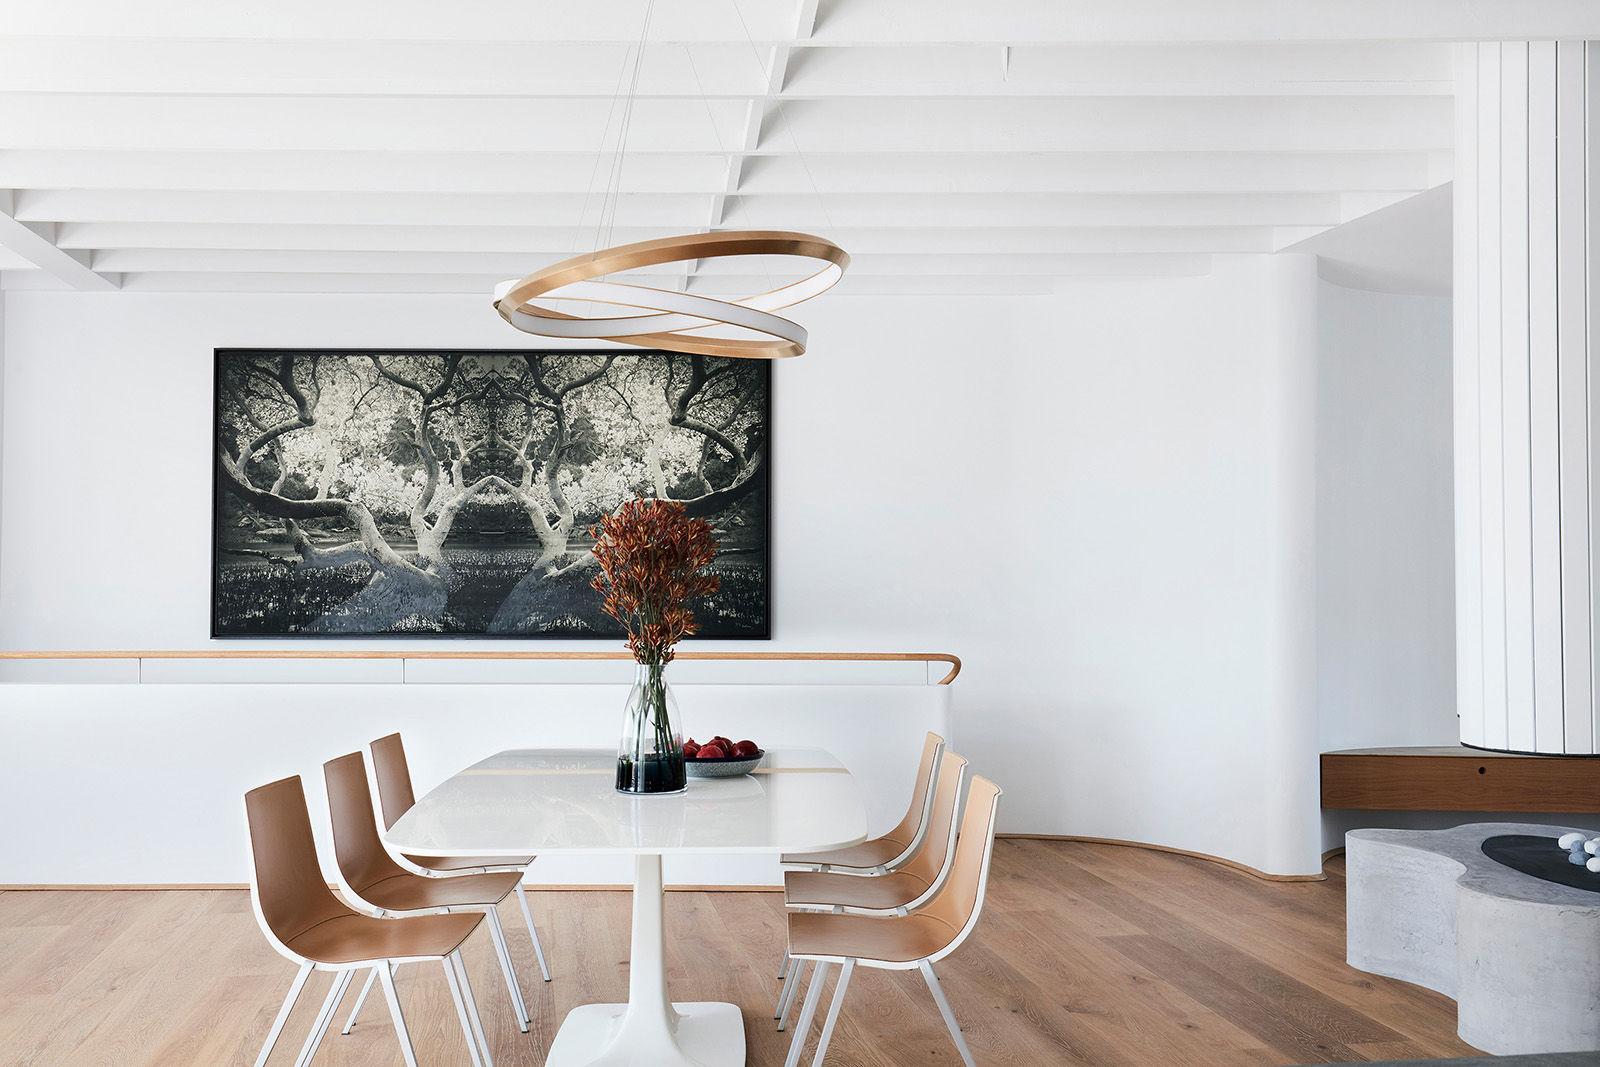 luigi-rosselli-architects---tamas-tee-home----012.jpg